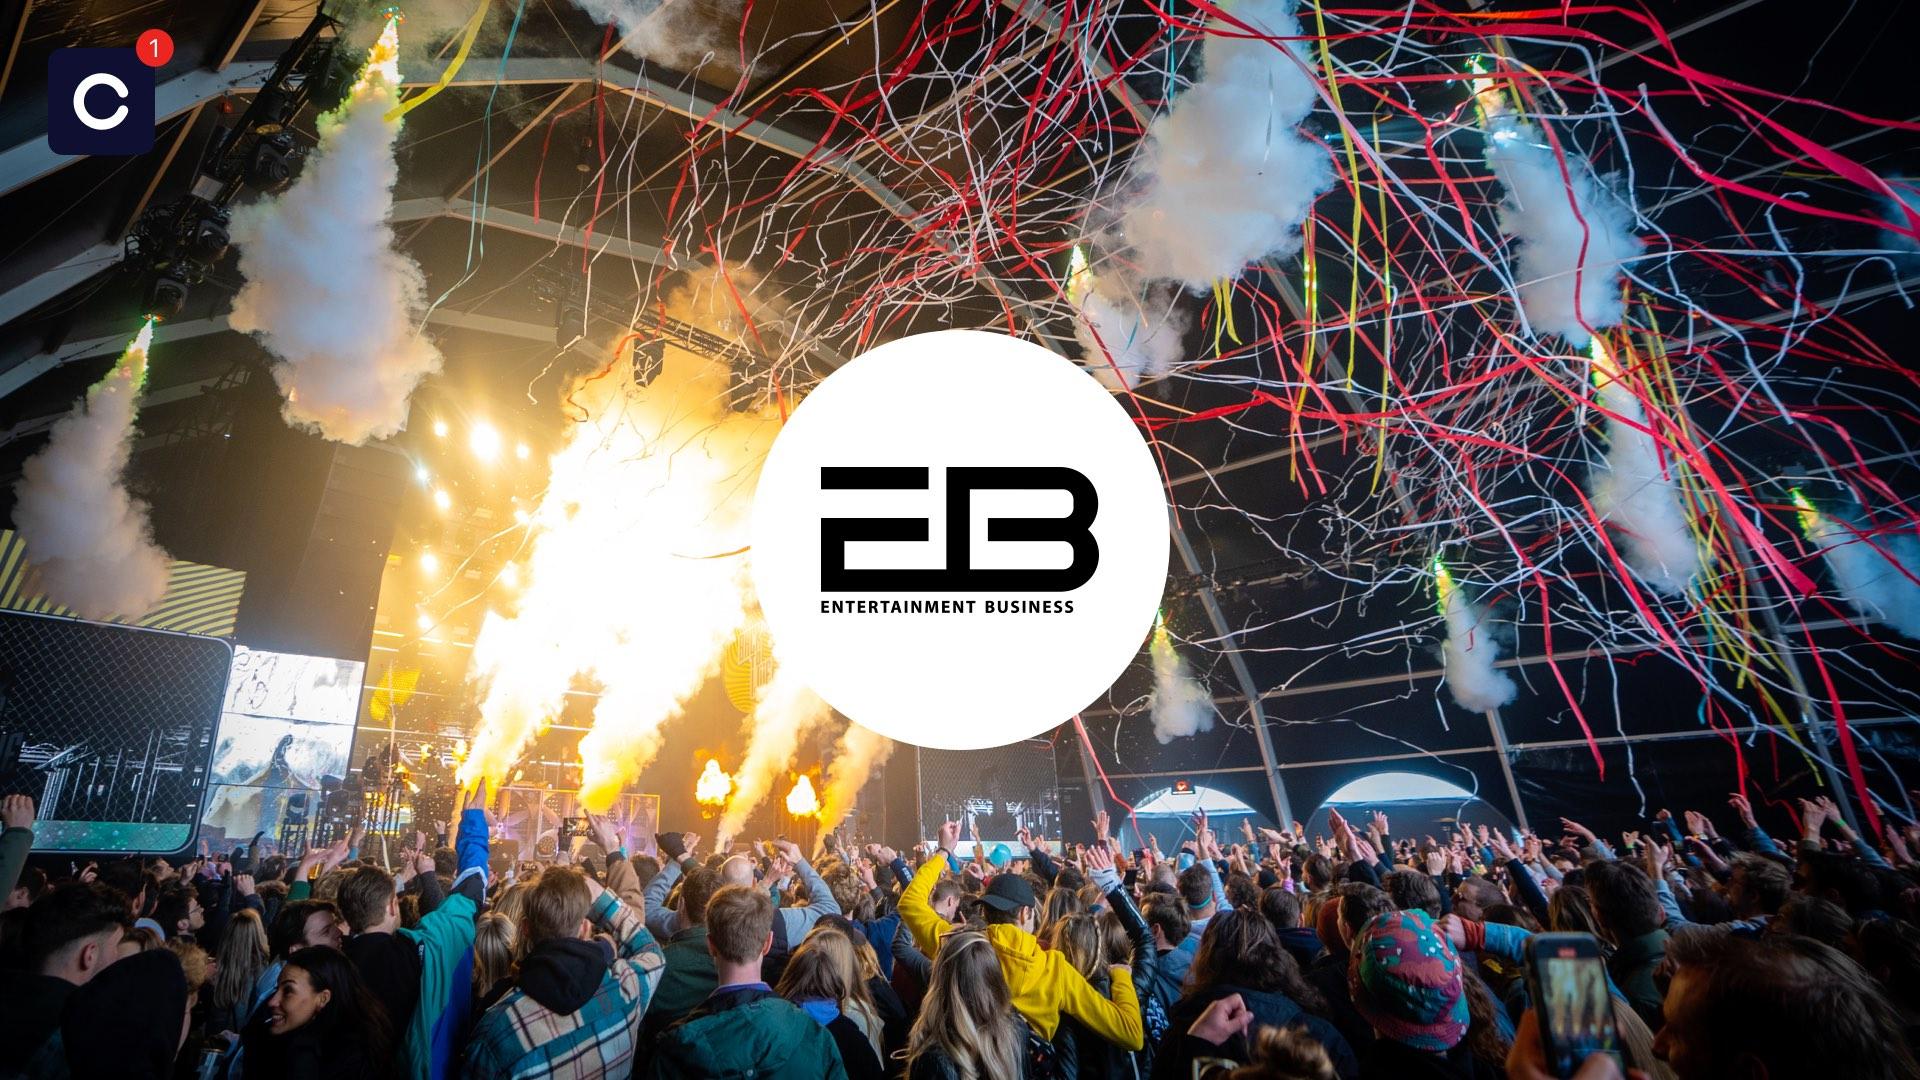 Close-app helpt festivals verantwoord van start te gaan